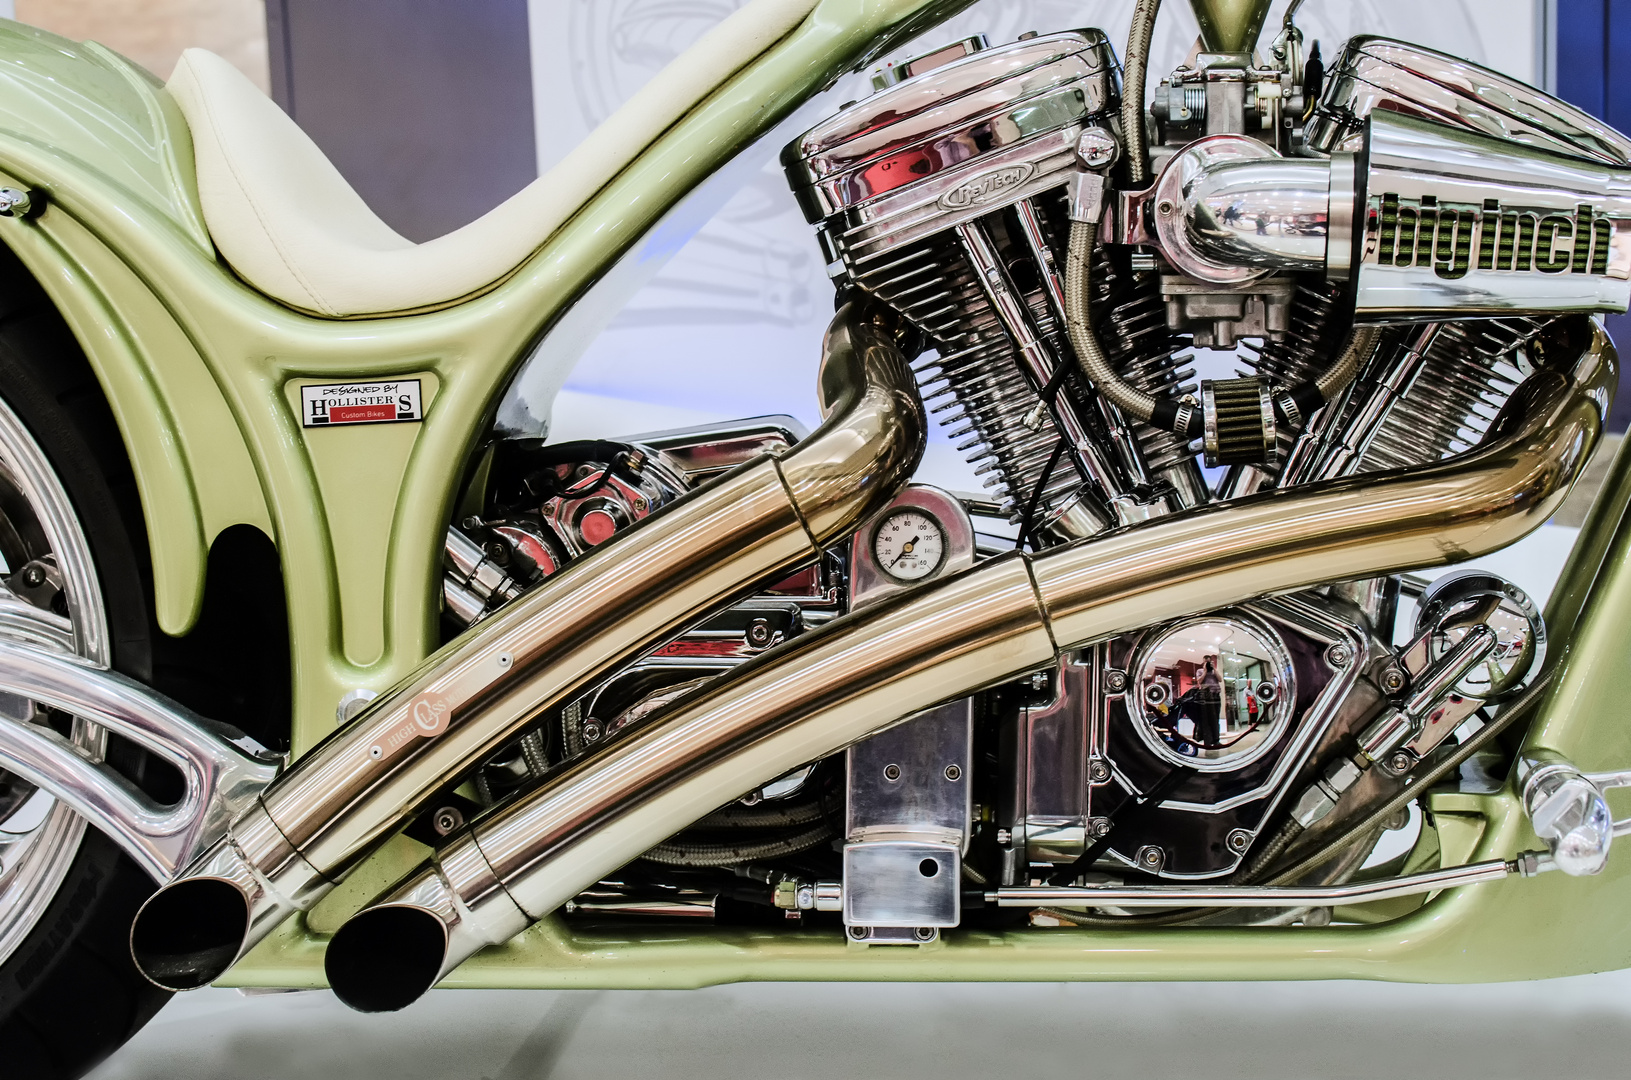 Motorradtraum